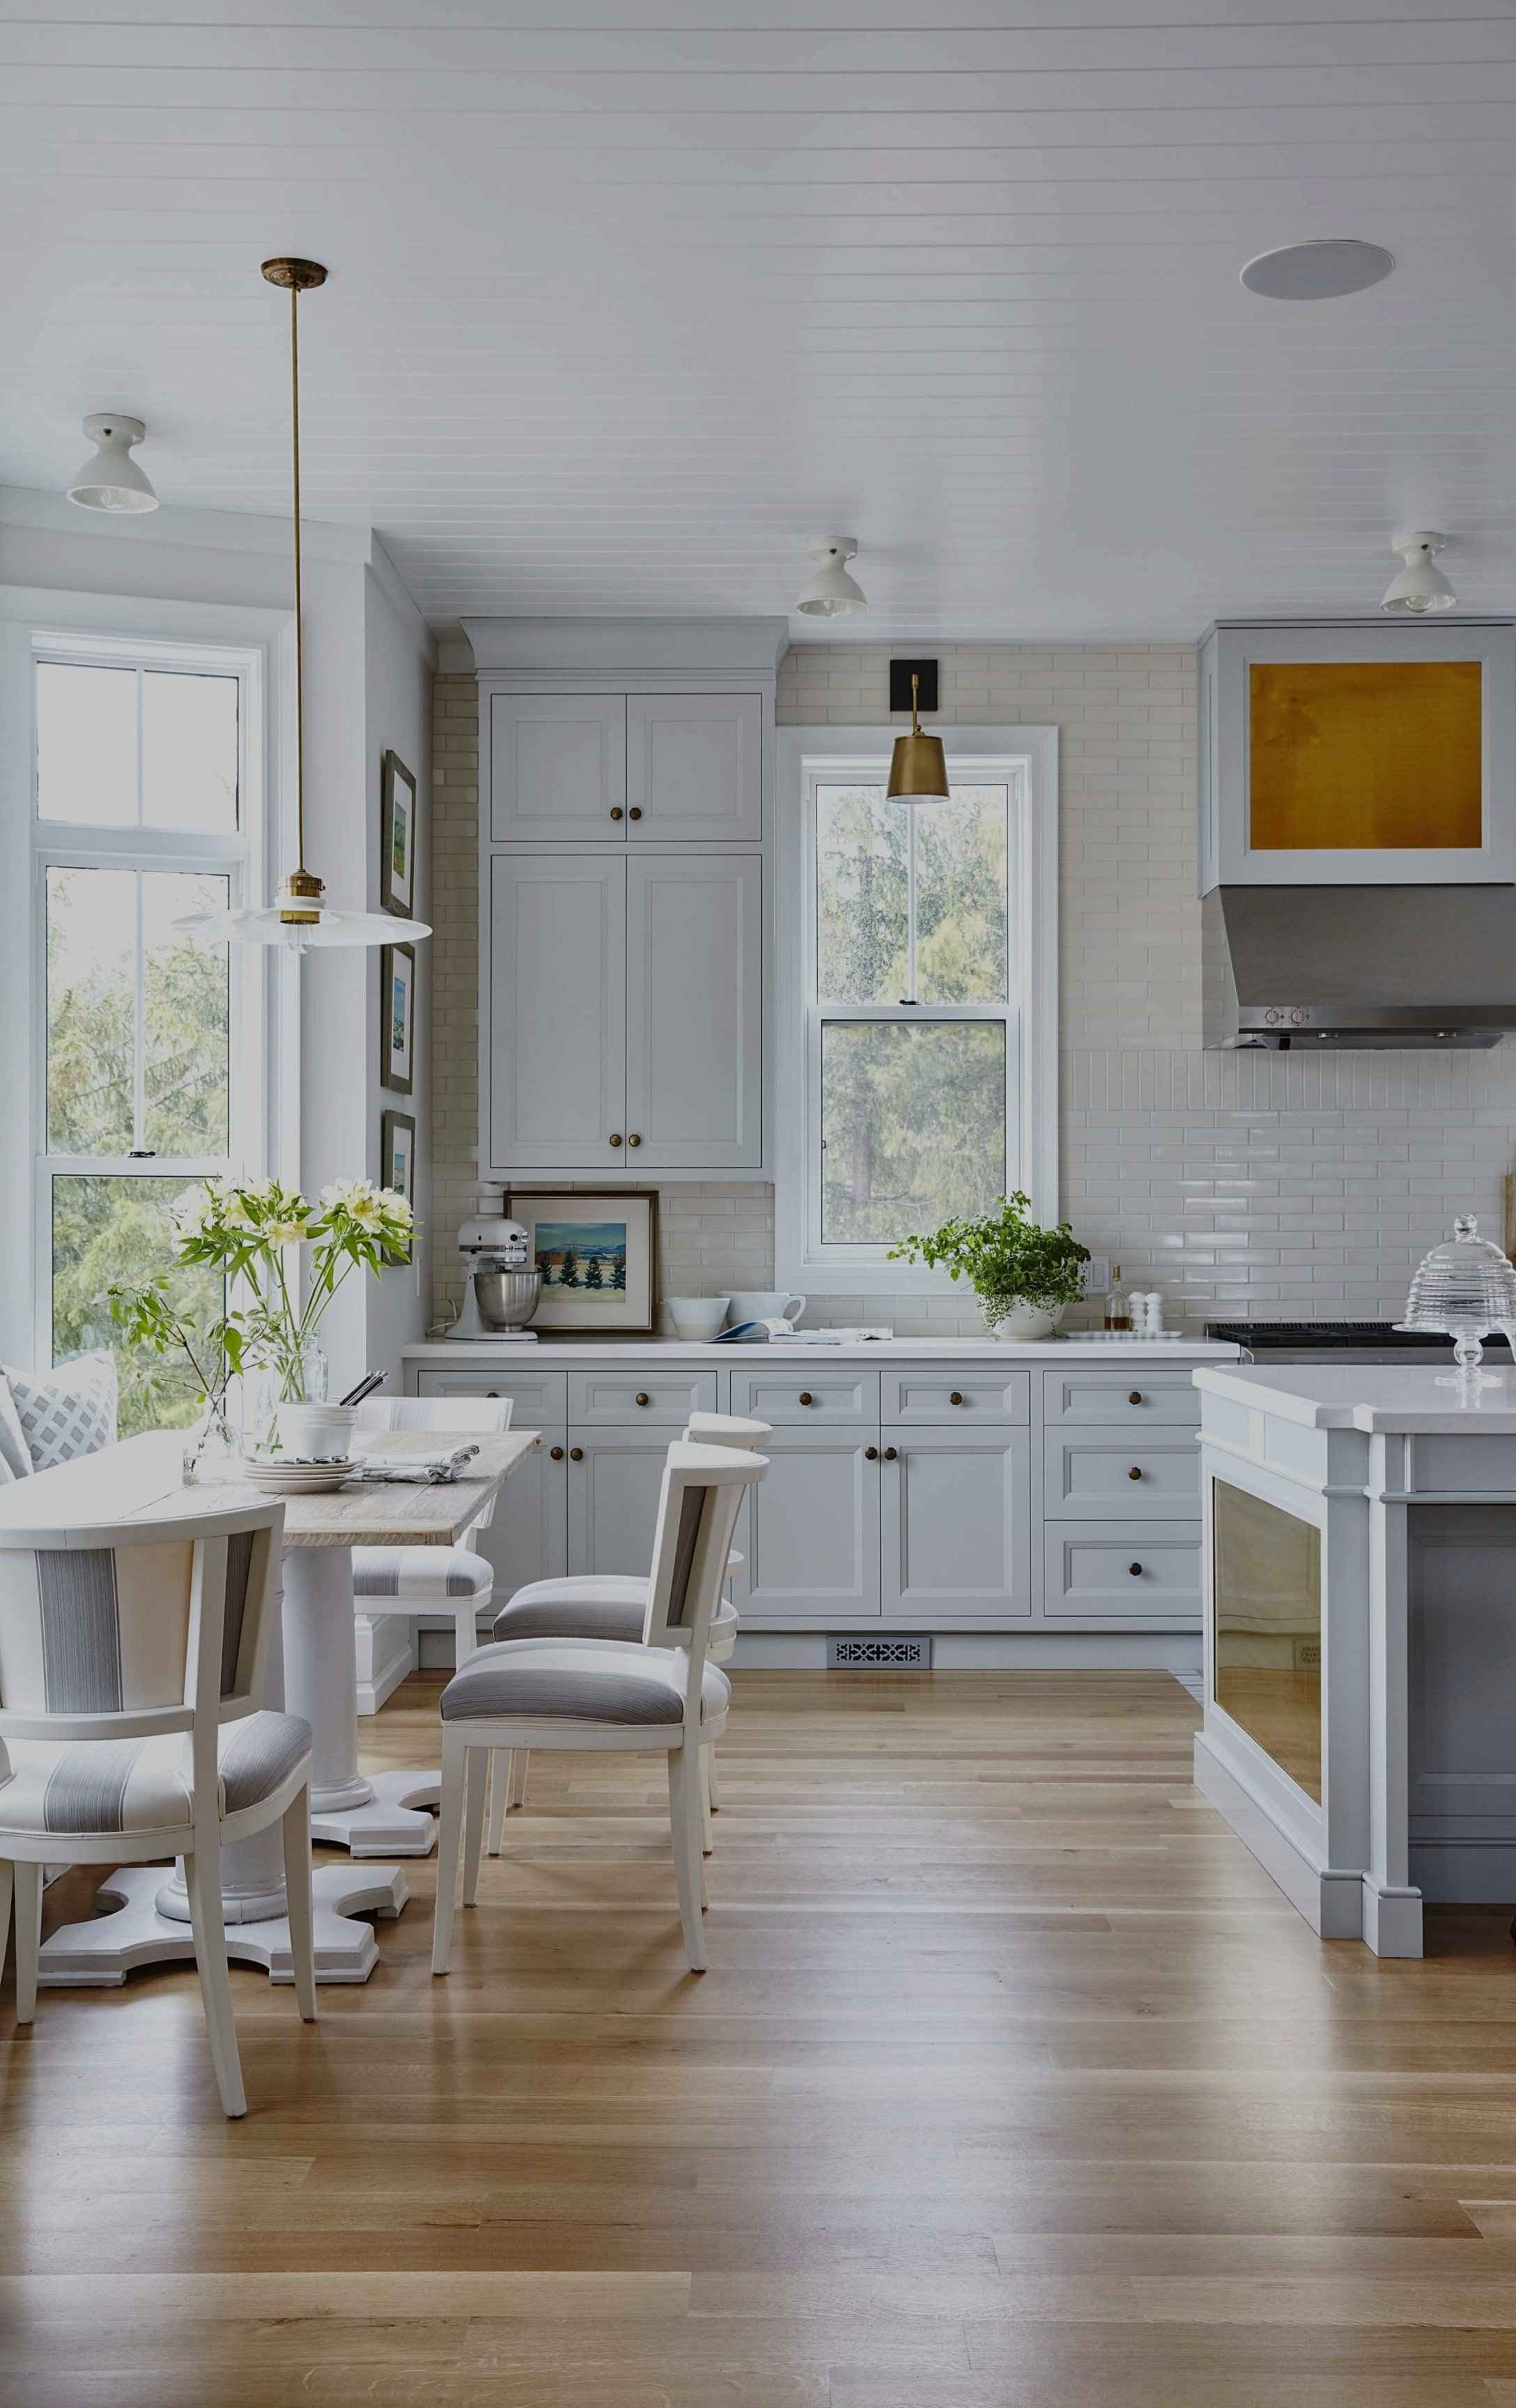 Small Bedroom Storage Ideas Inspirational 13 Stylish Black Hardwood Floors In Kitchen